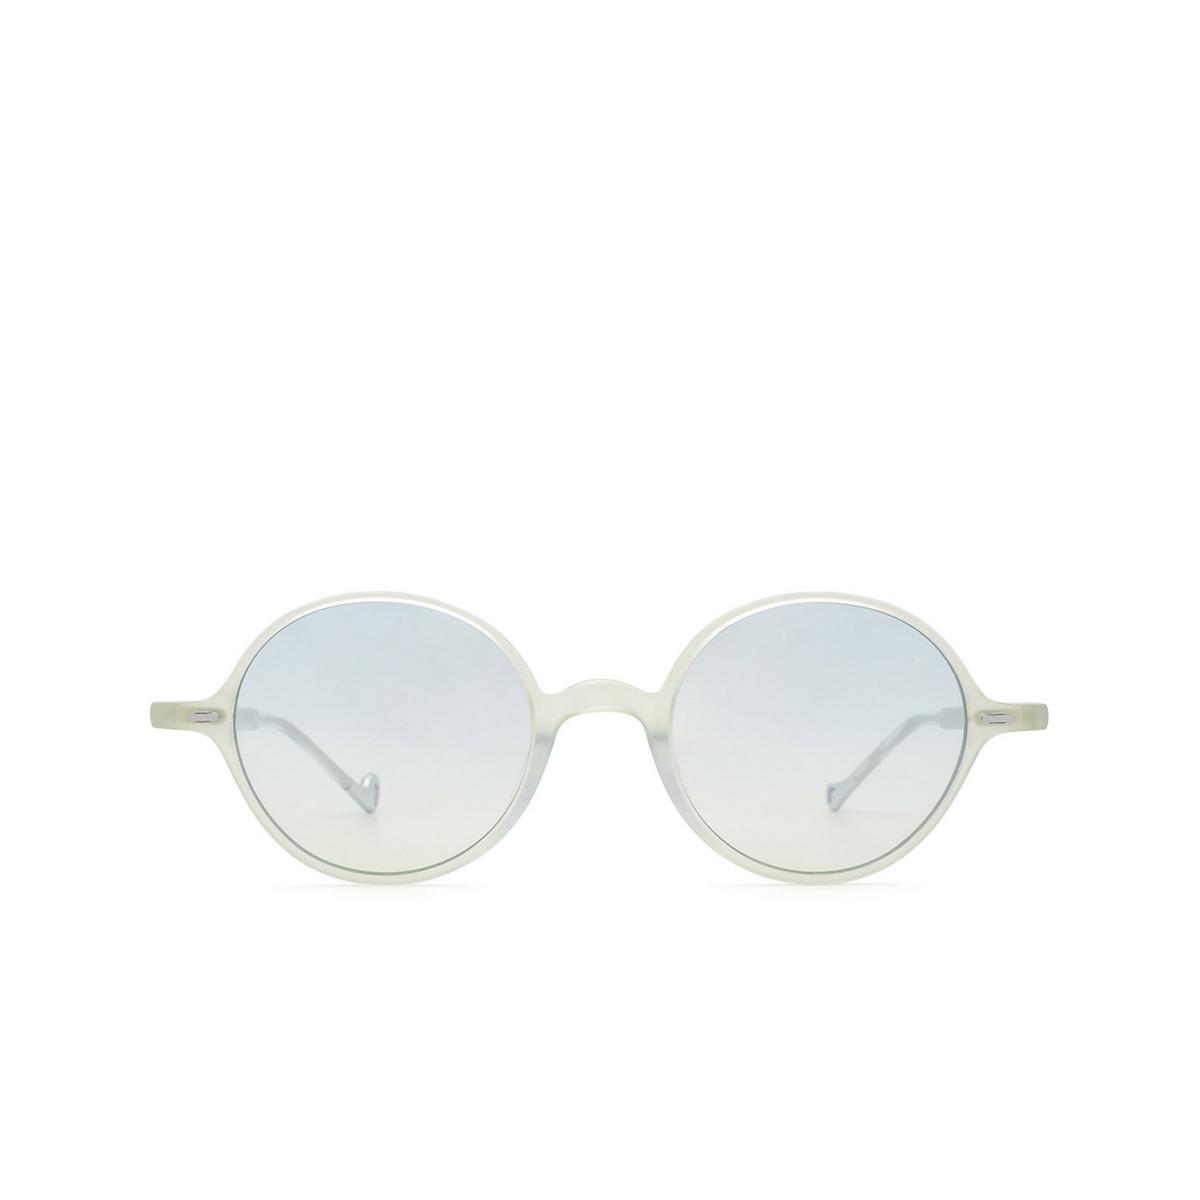 Eyepetizer® Round Sunglasses: Pallavicini color Green Aqua Marine C.A/A-23F - front view.